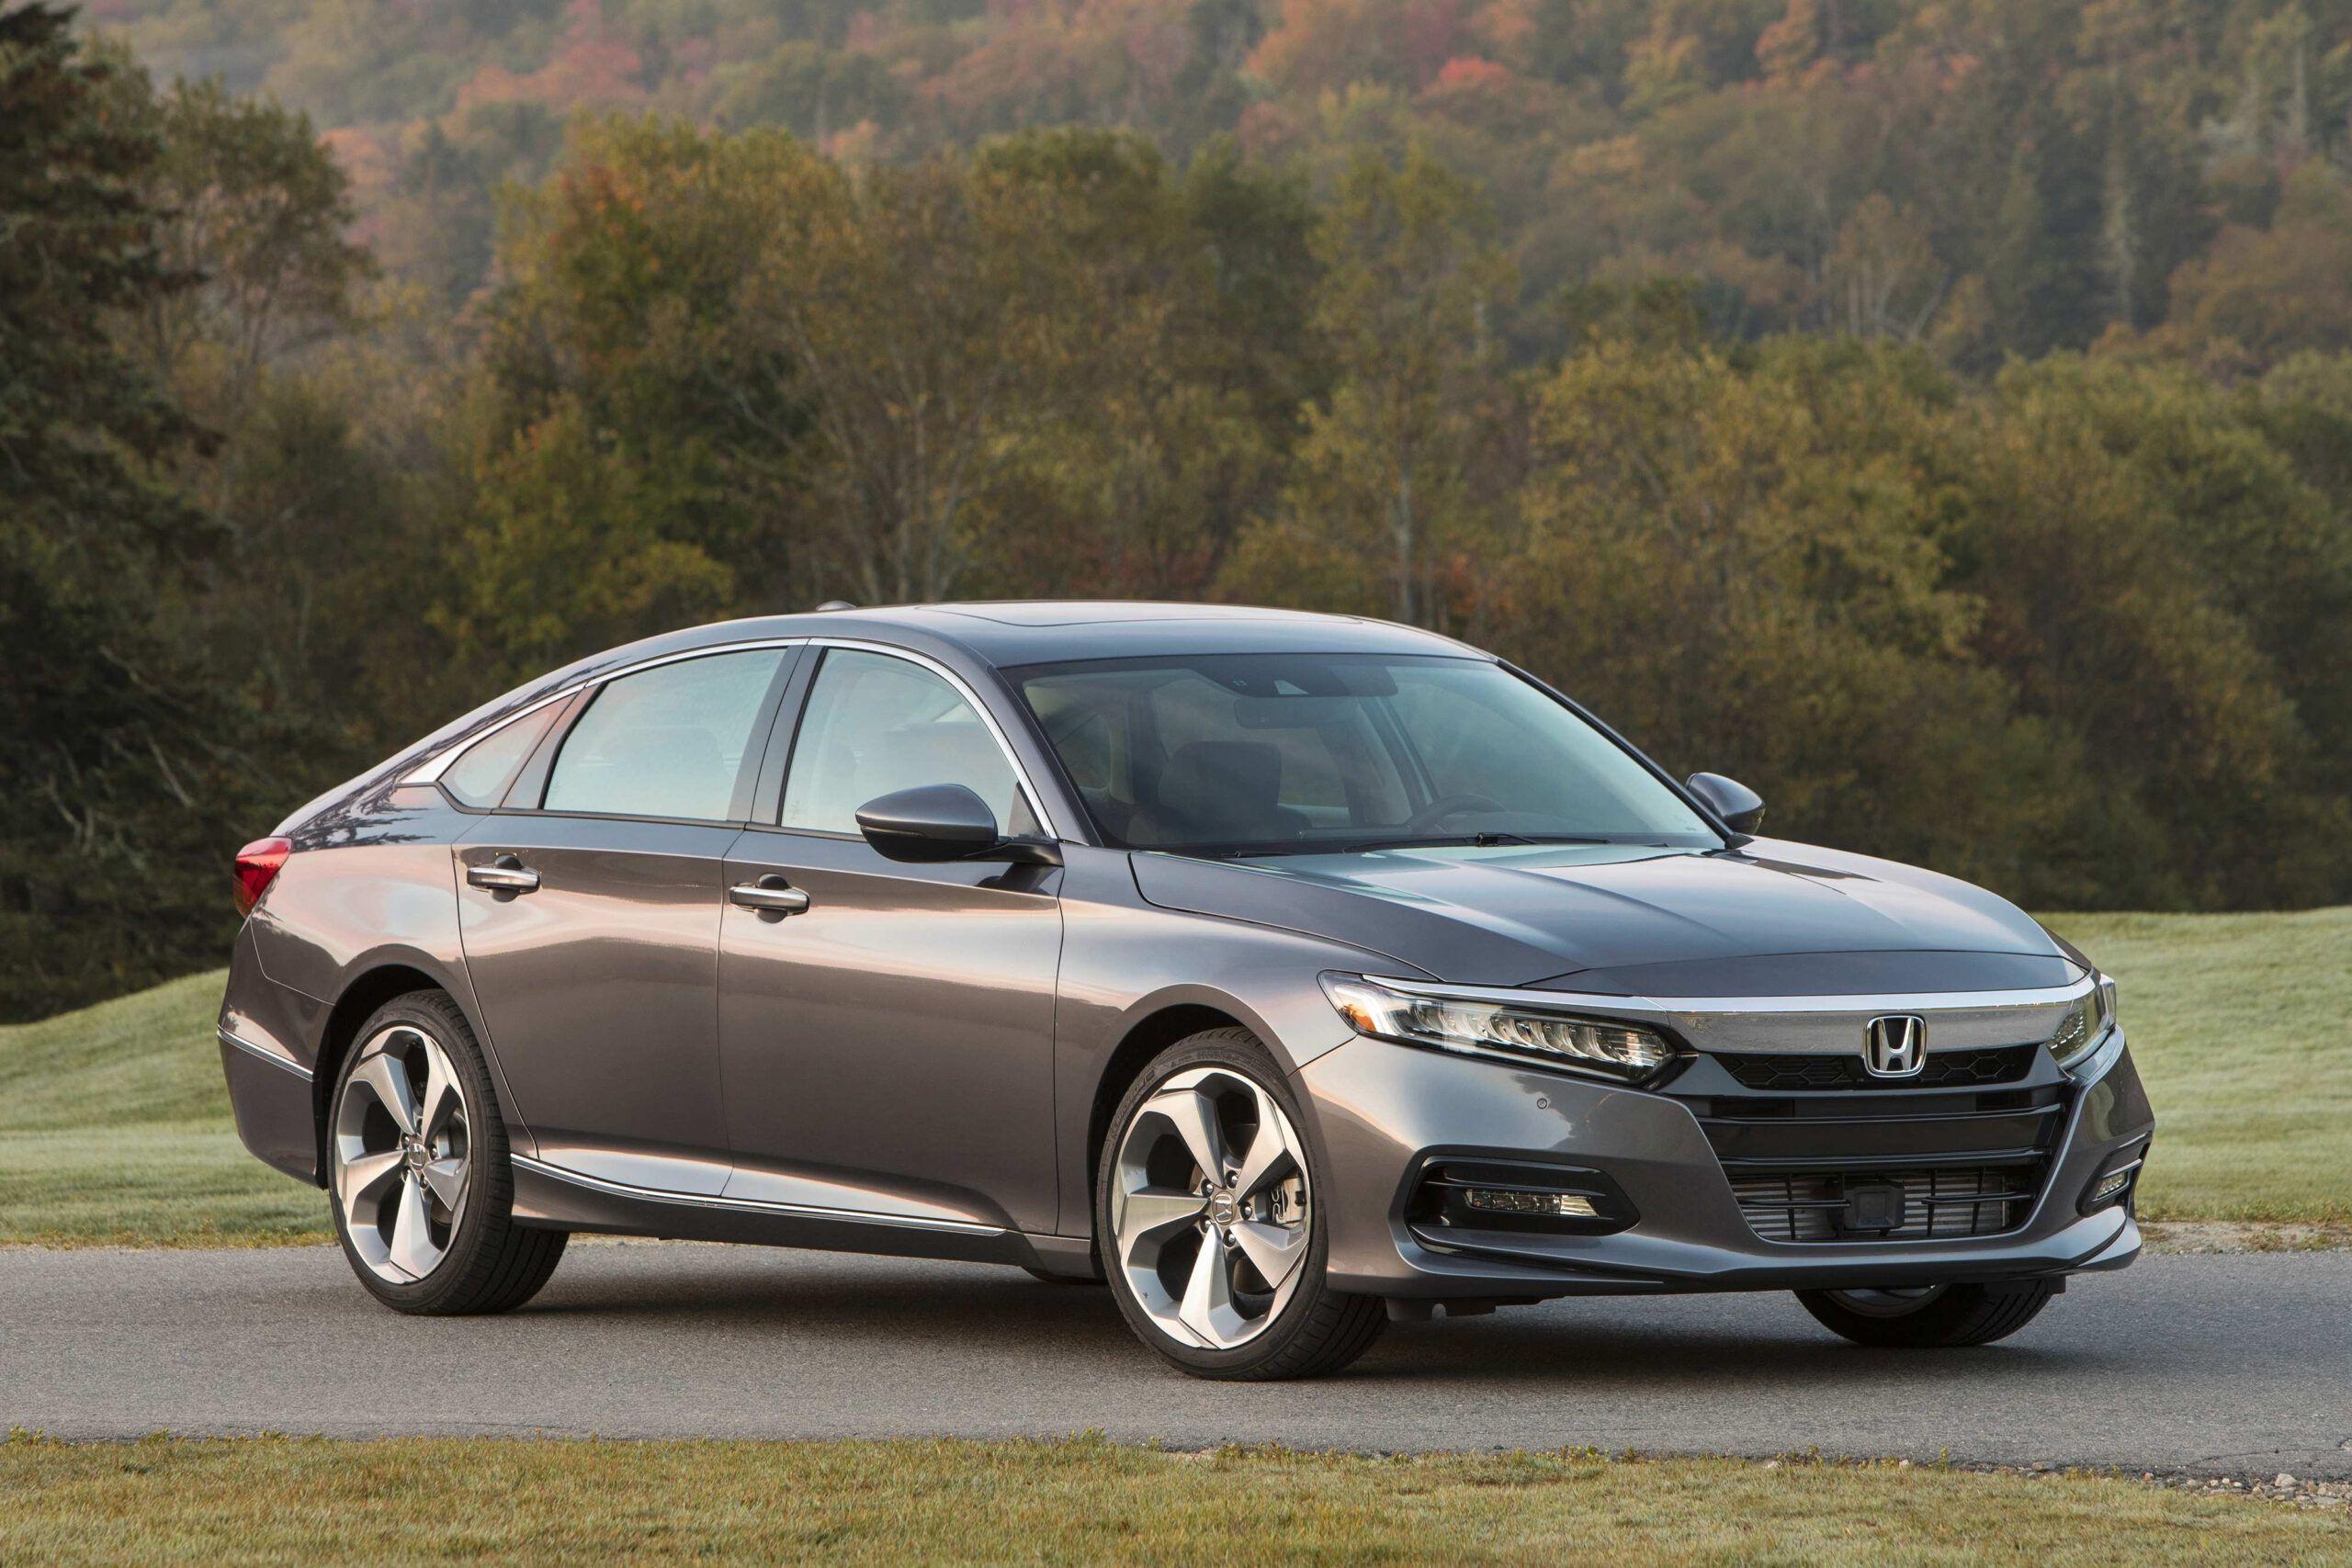 Honda Accord 2020 Redesign Engine in 2020 Honda accord